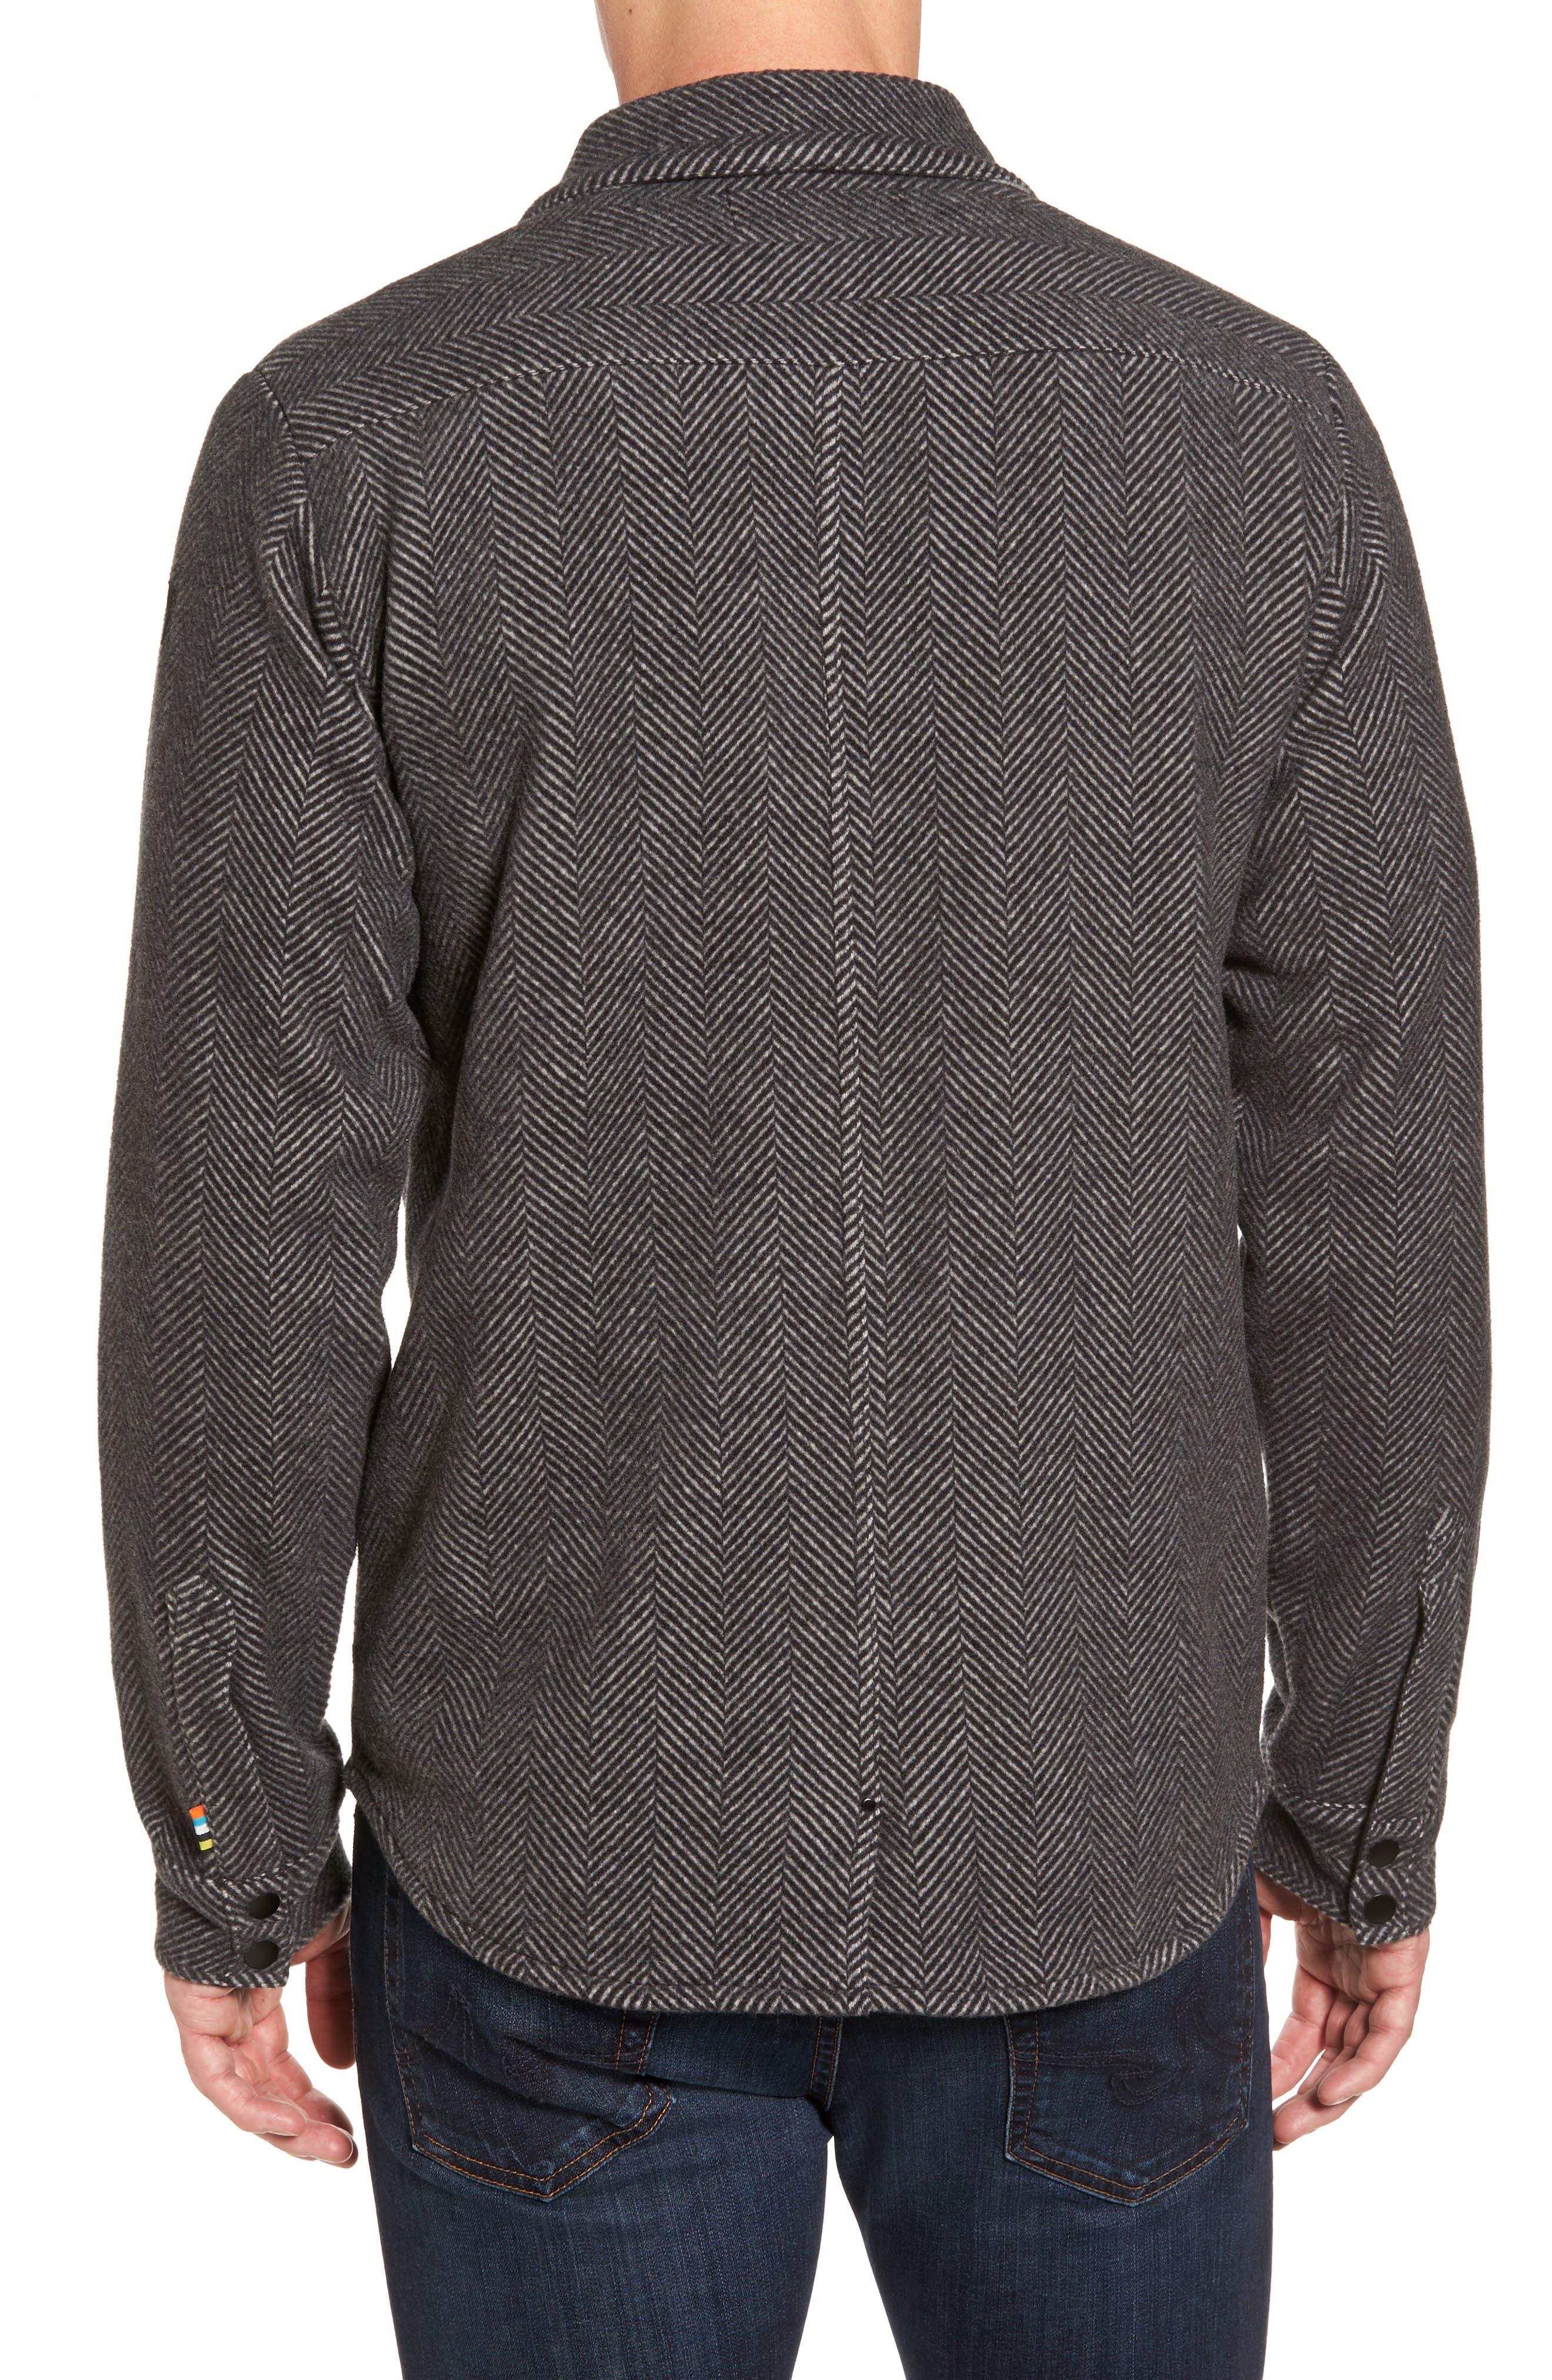 Anchor Line Herringbone Wool Blend Shirt Jacket,                             Alternate thumbnail 2, color,